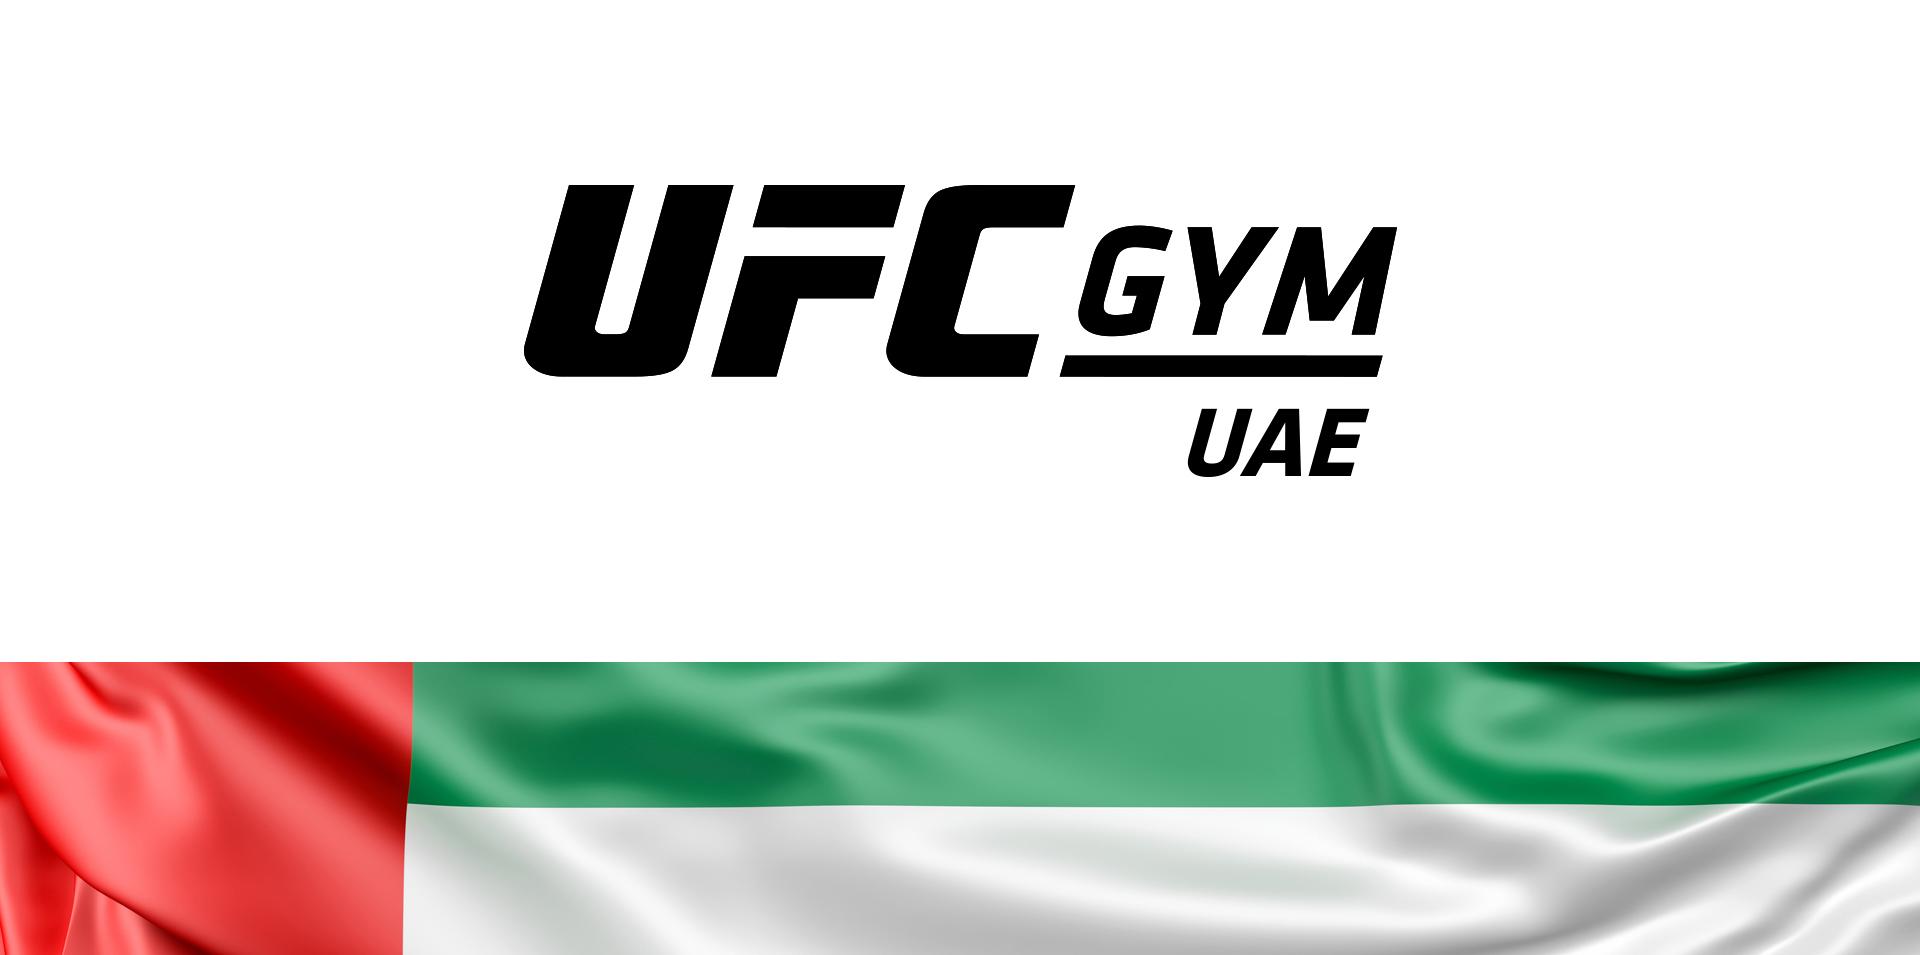 United Arab Emirates Featured Image